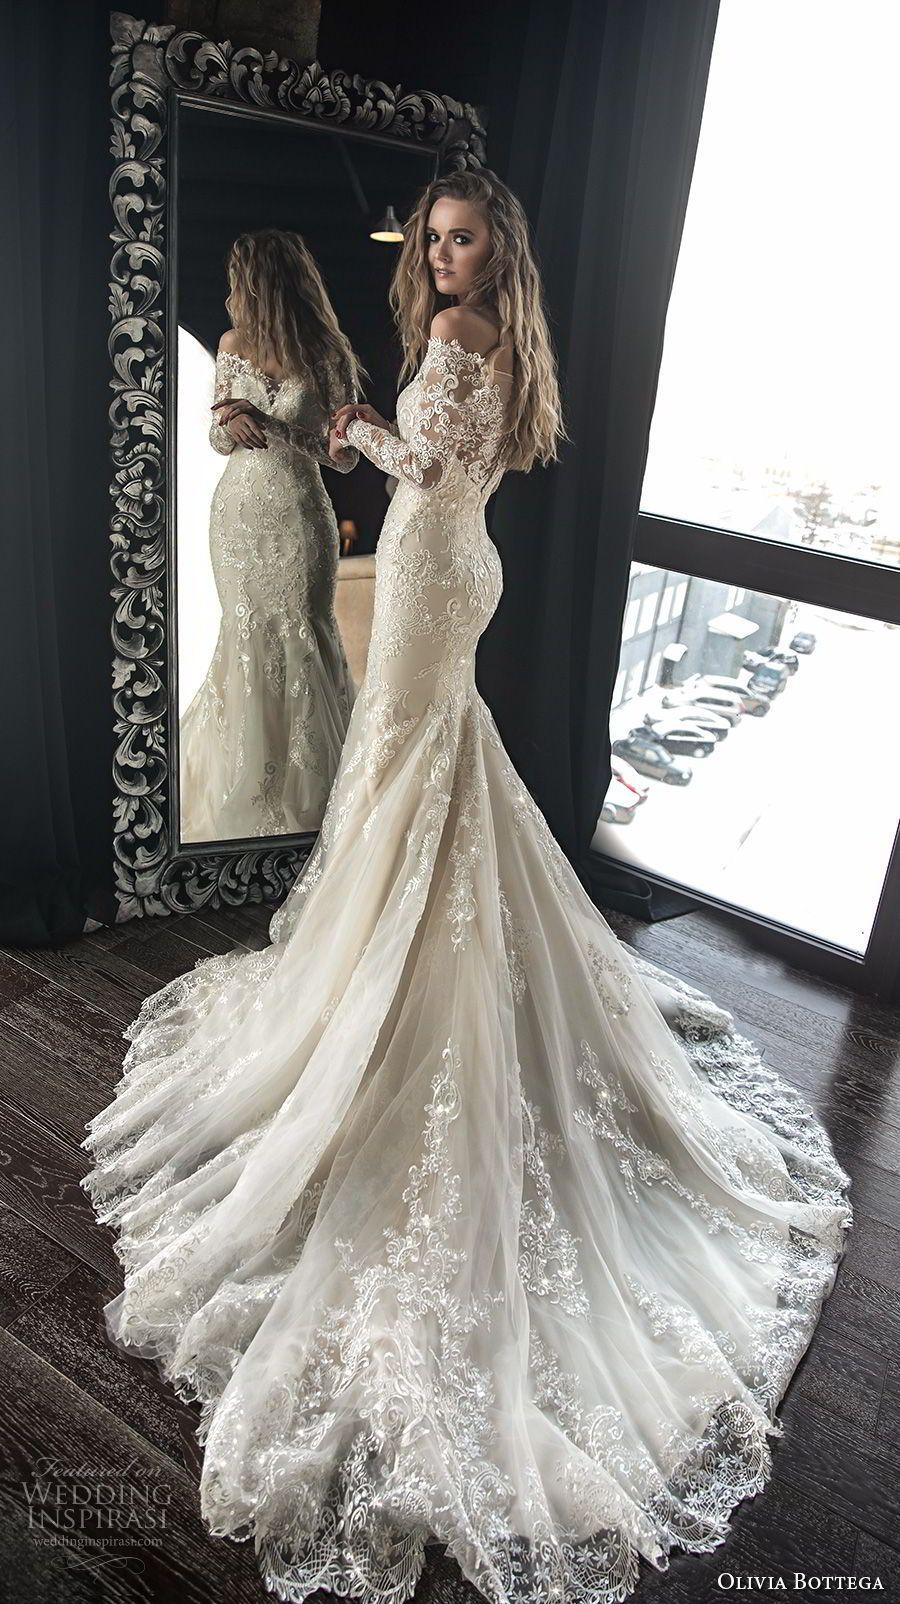 Olivia Bottega 2018 Wedding Dresses Wedding Inspirasi Beautiful Bridal Dresses Wedding Dresses Beaded Dream Wedding Dresses [ 1604 x 900 Pixel ]